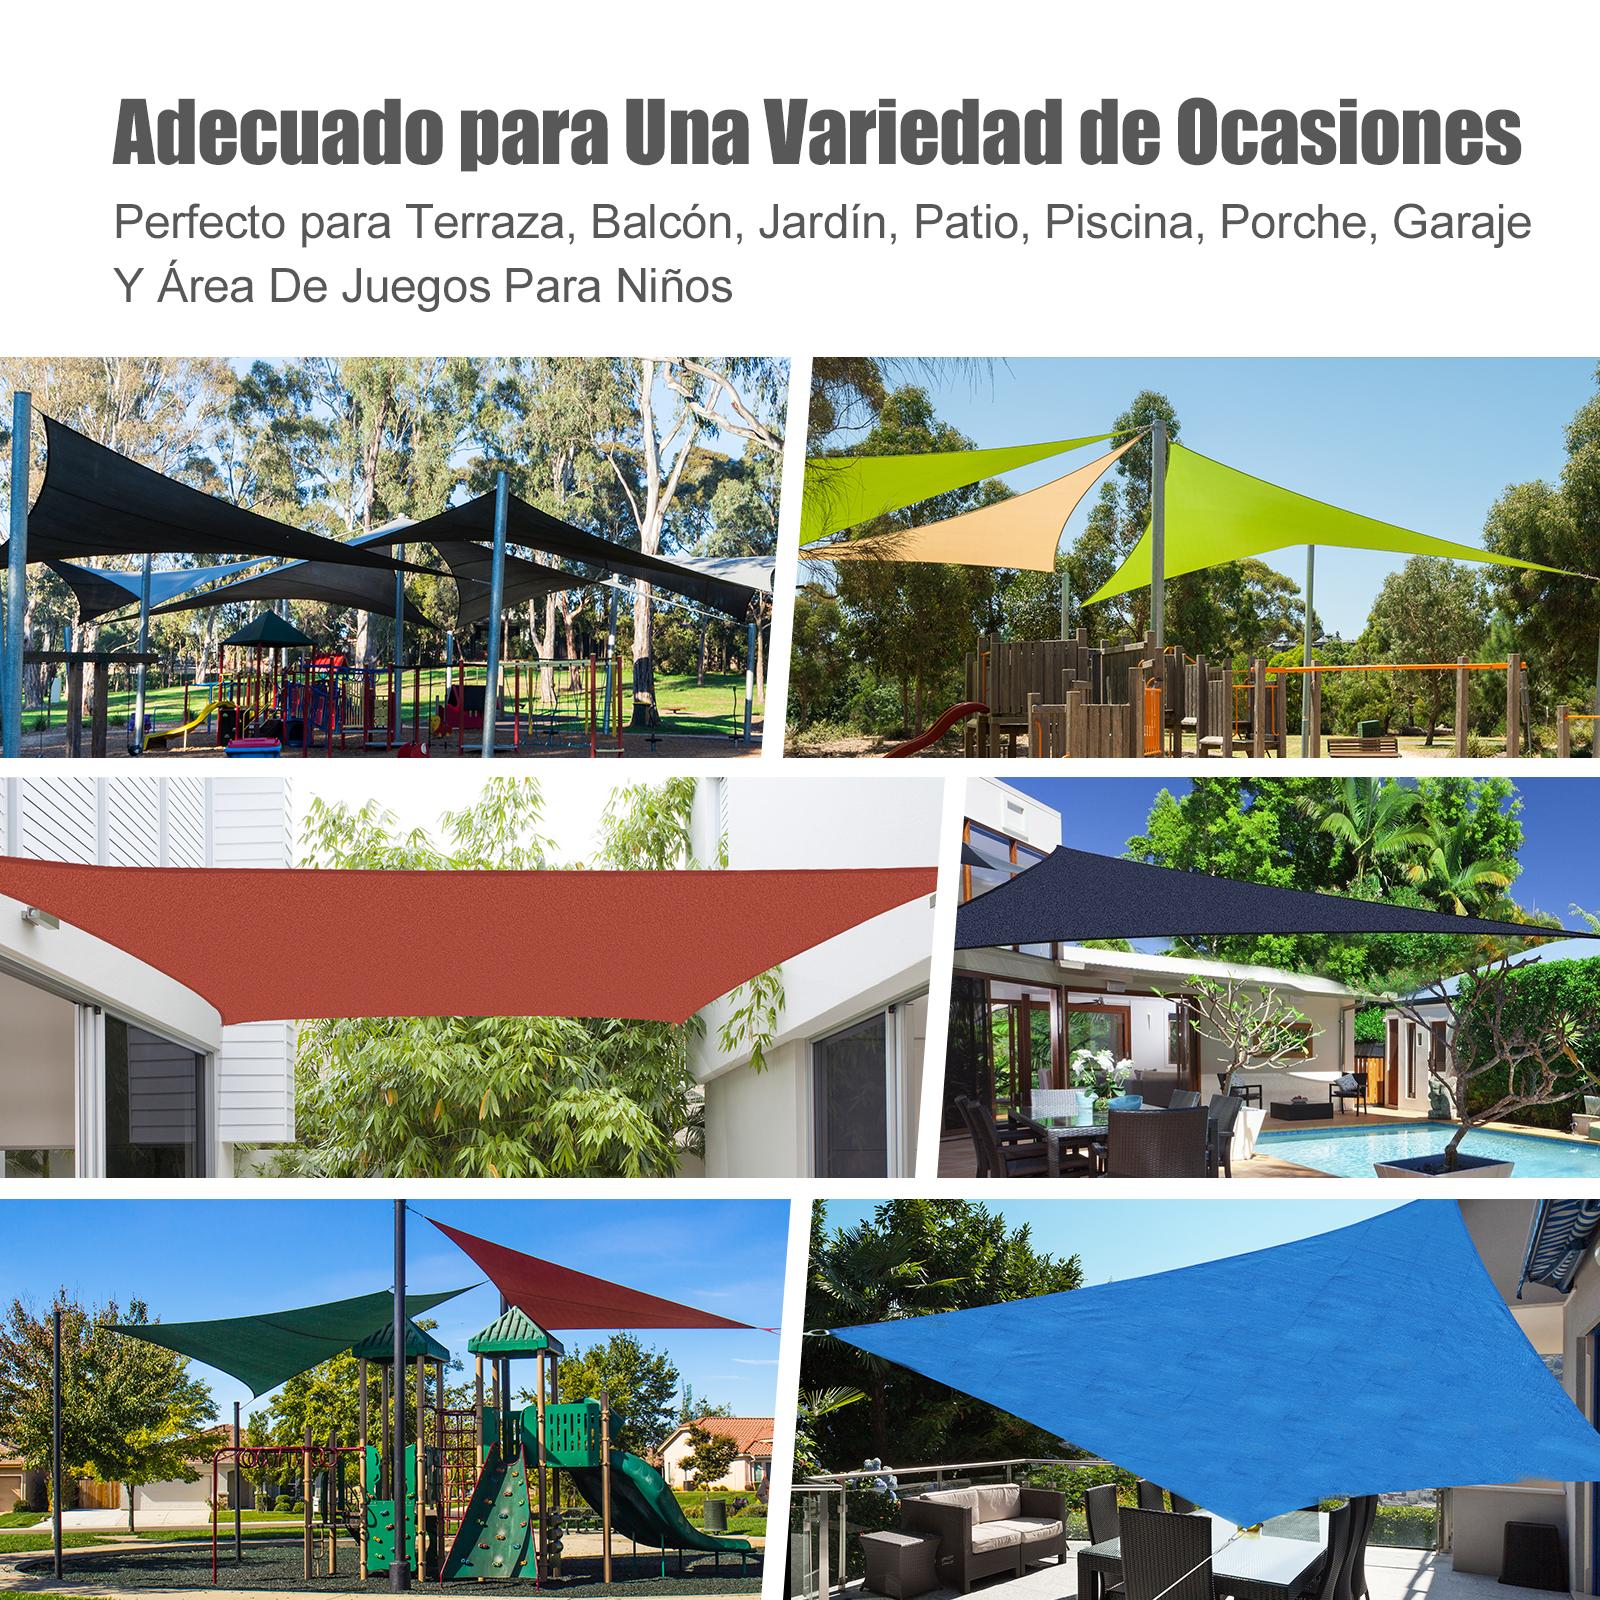 Toldo-Vela-Sombrilla-Parasol-Triangulo-Tejido-de-Poliester-160g-m2-Jardin-Playa miniatura 7